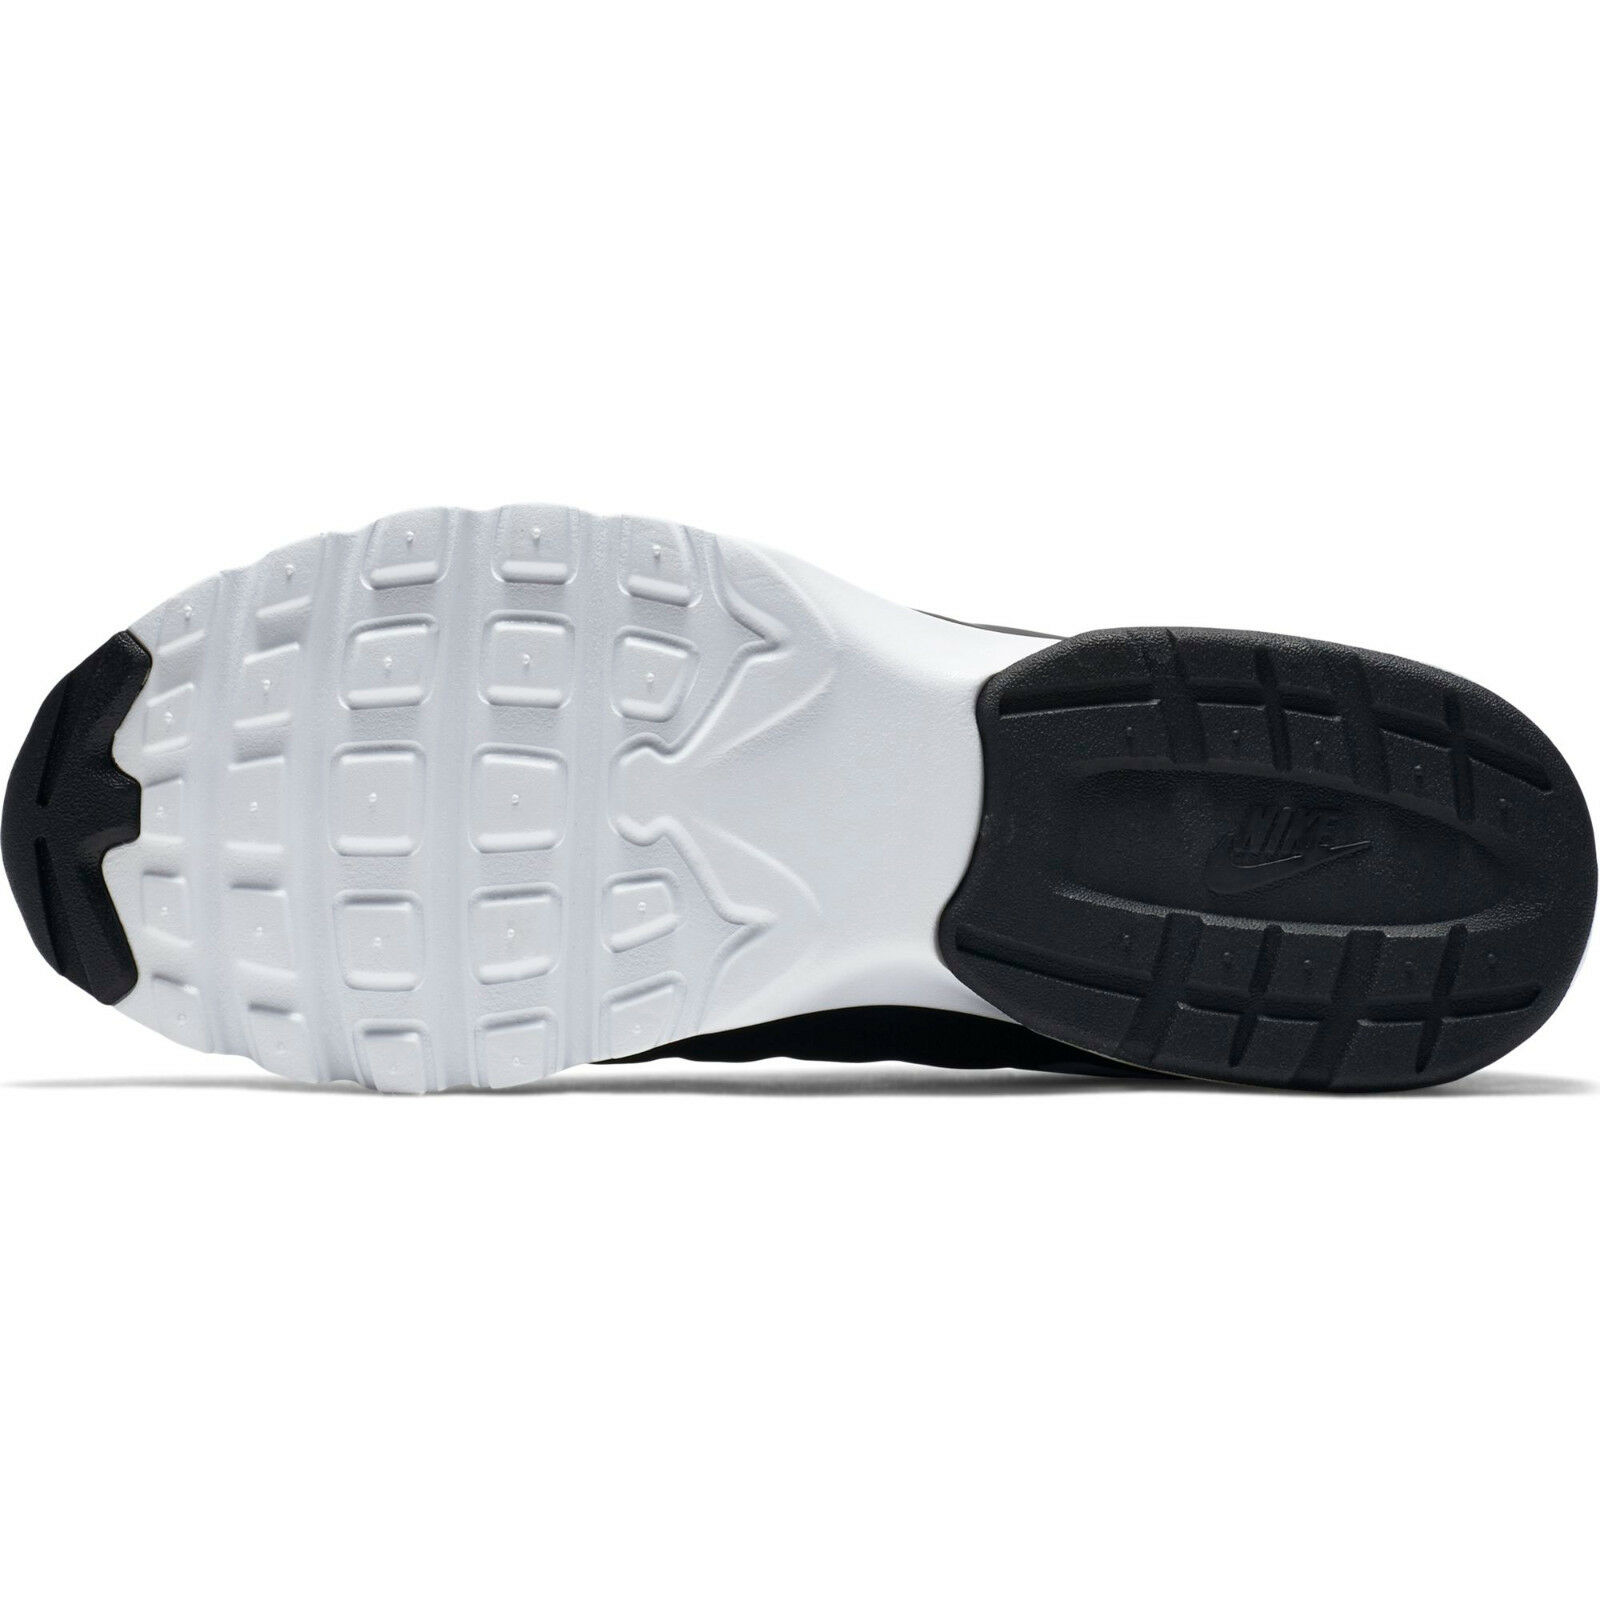 Nike Air Max INVIGOR INVIGOR INVIGOR Turnschuhe LTD Classic Sportschuhe Turnschuh 749680 61b9dc